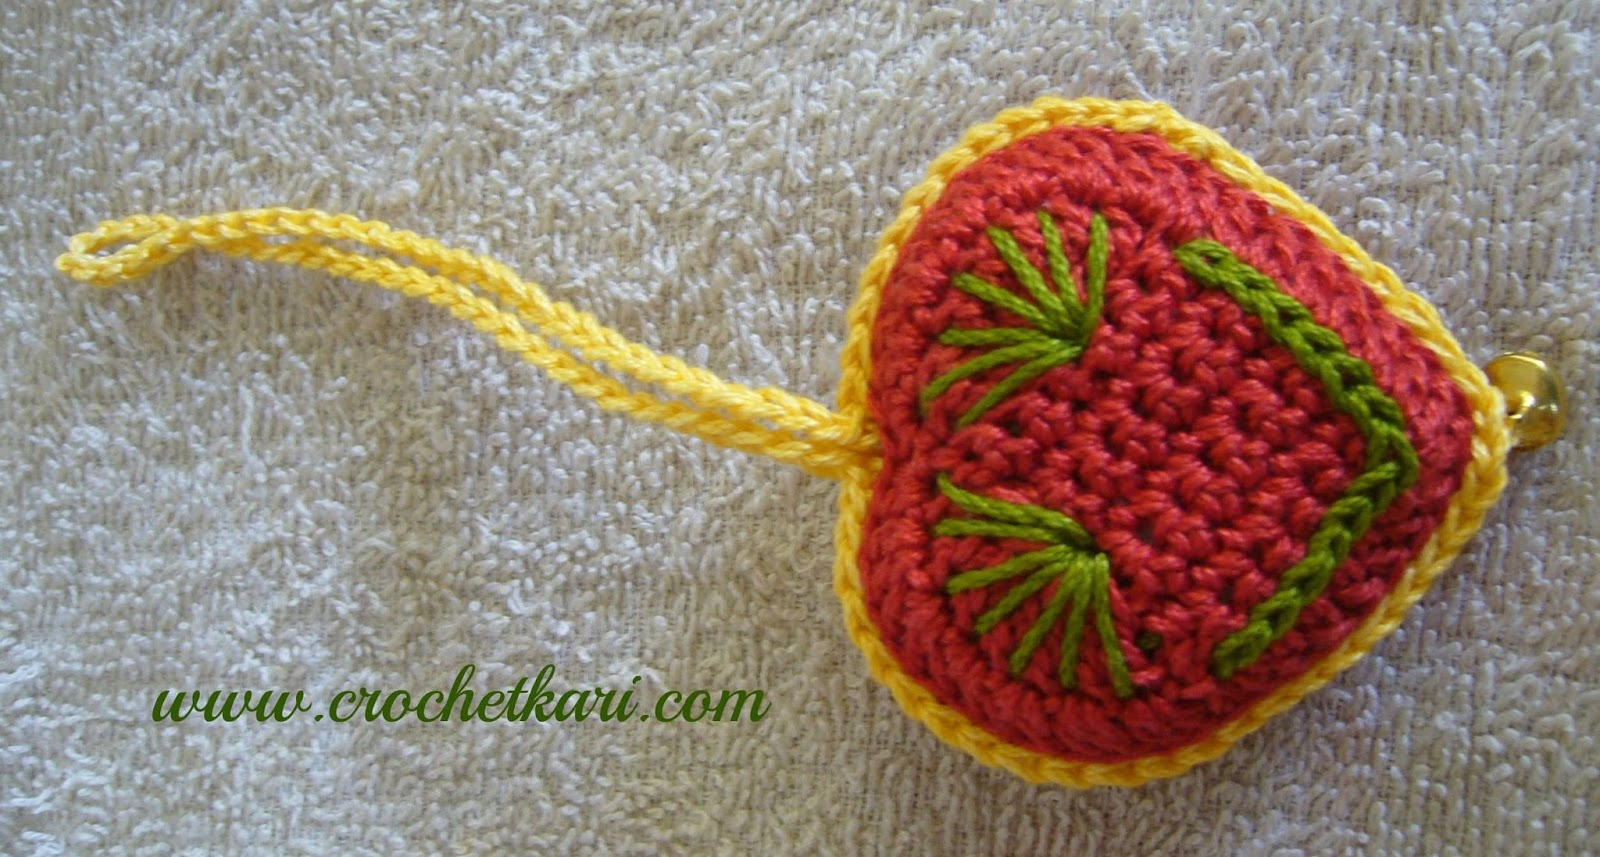 red crochet heart